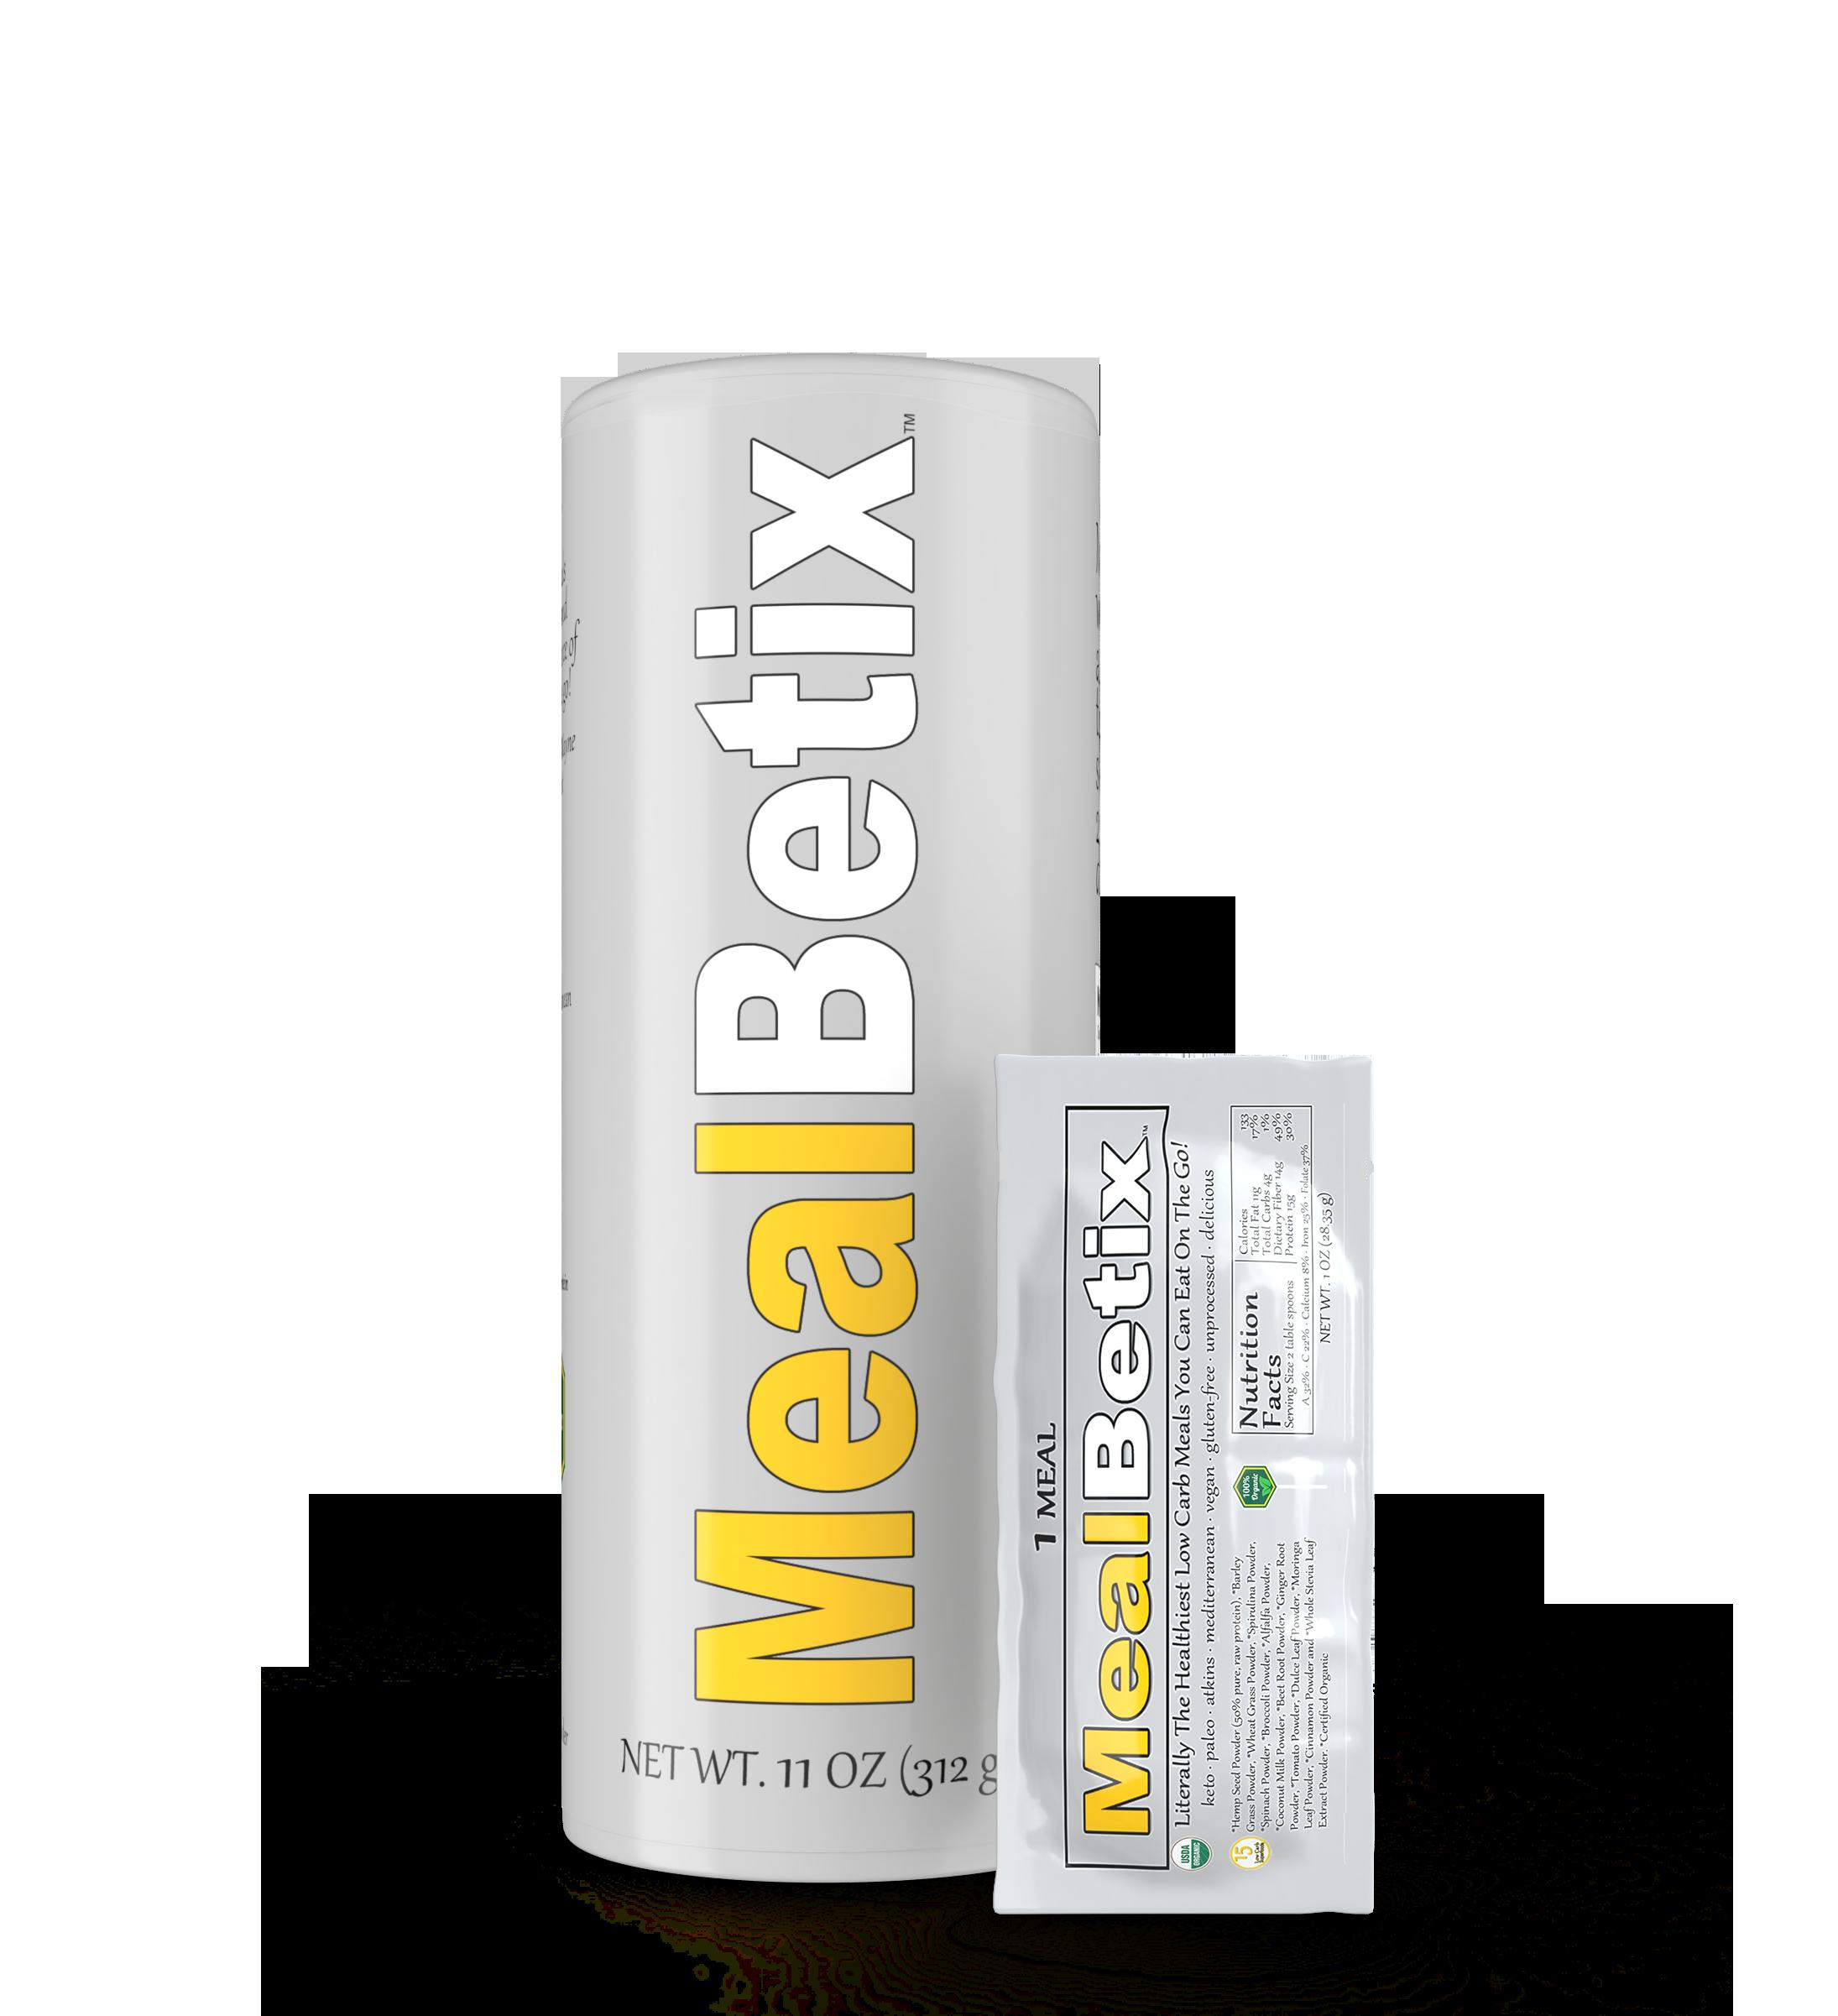 MealBetix meal